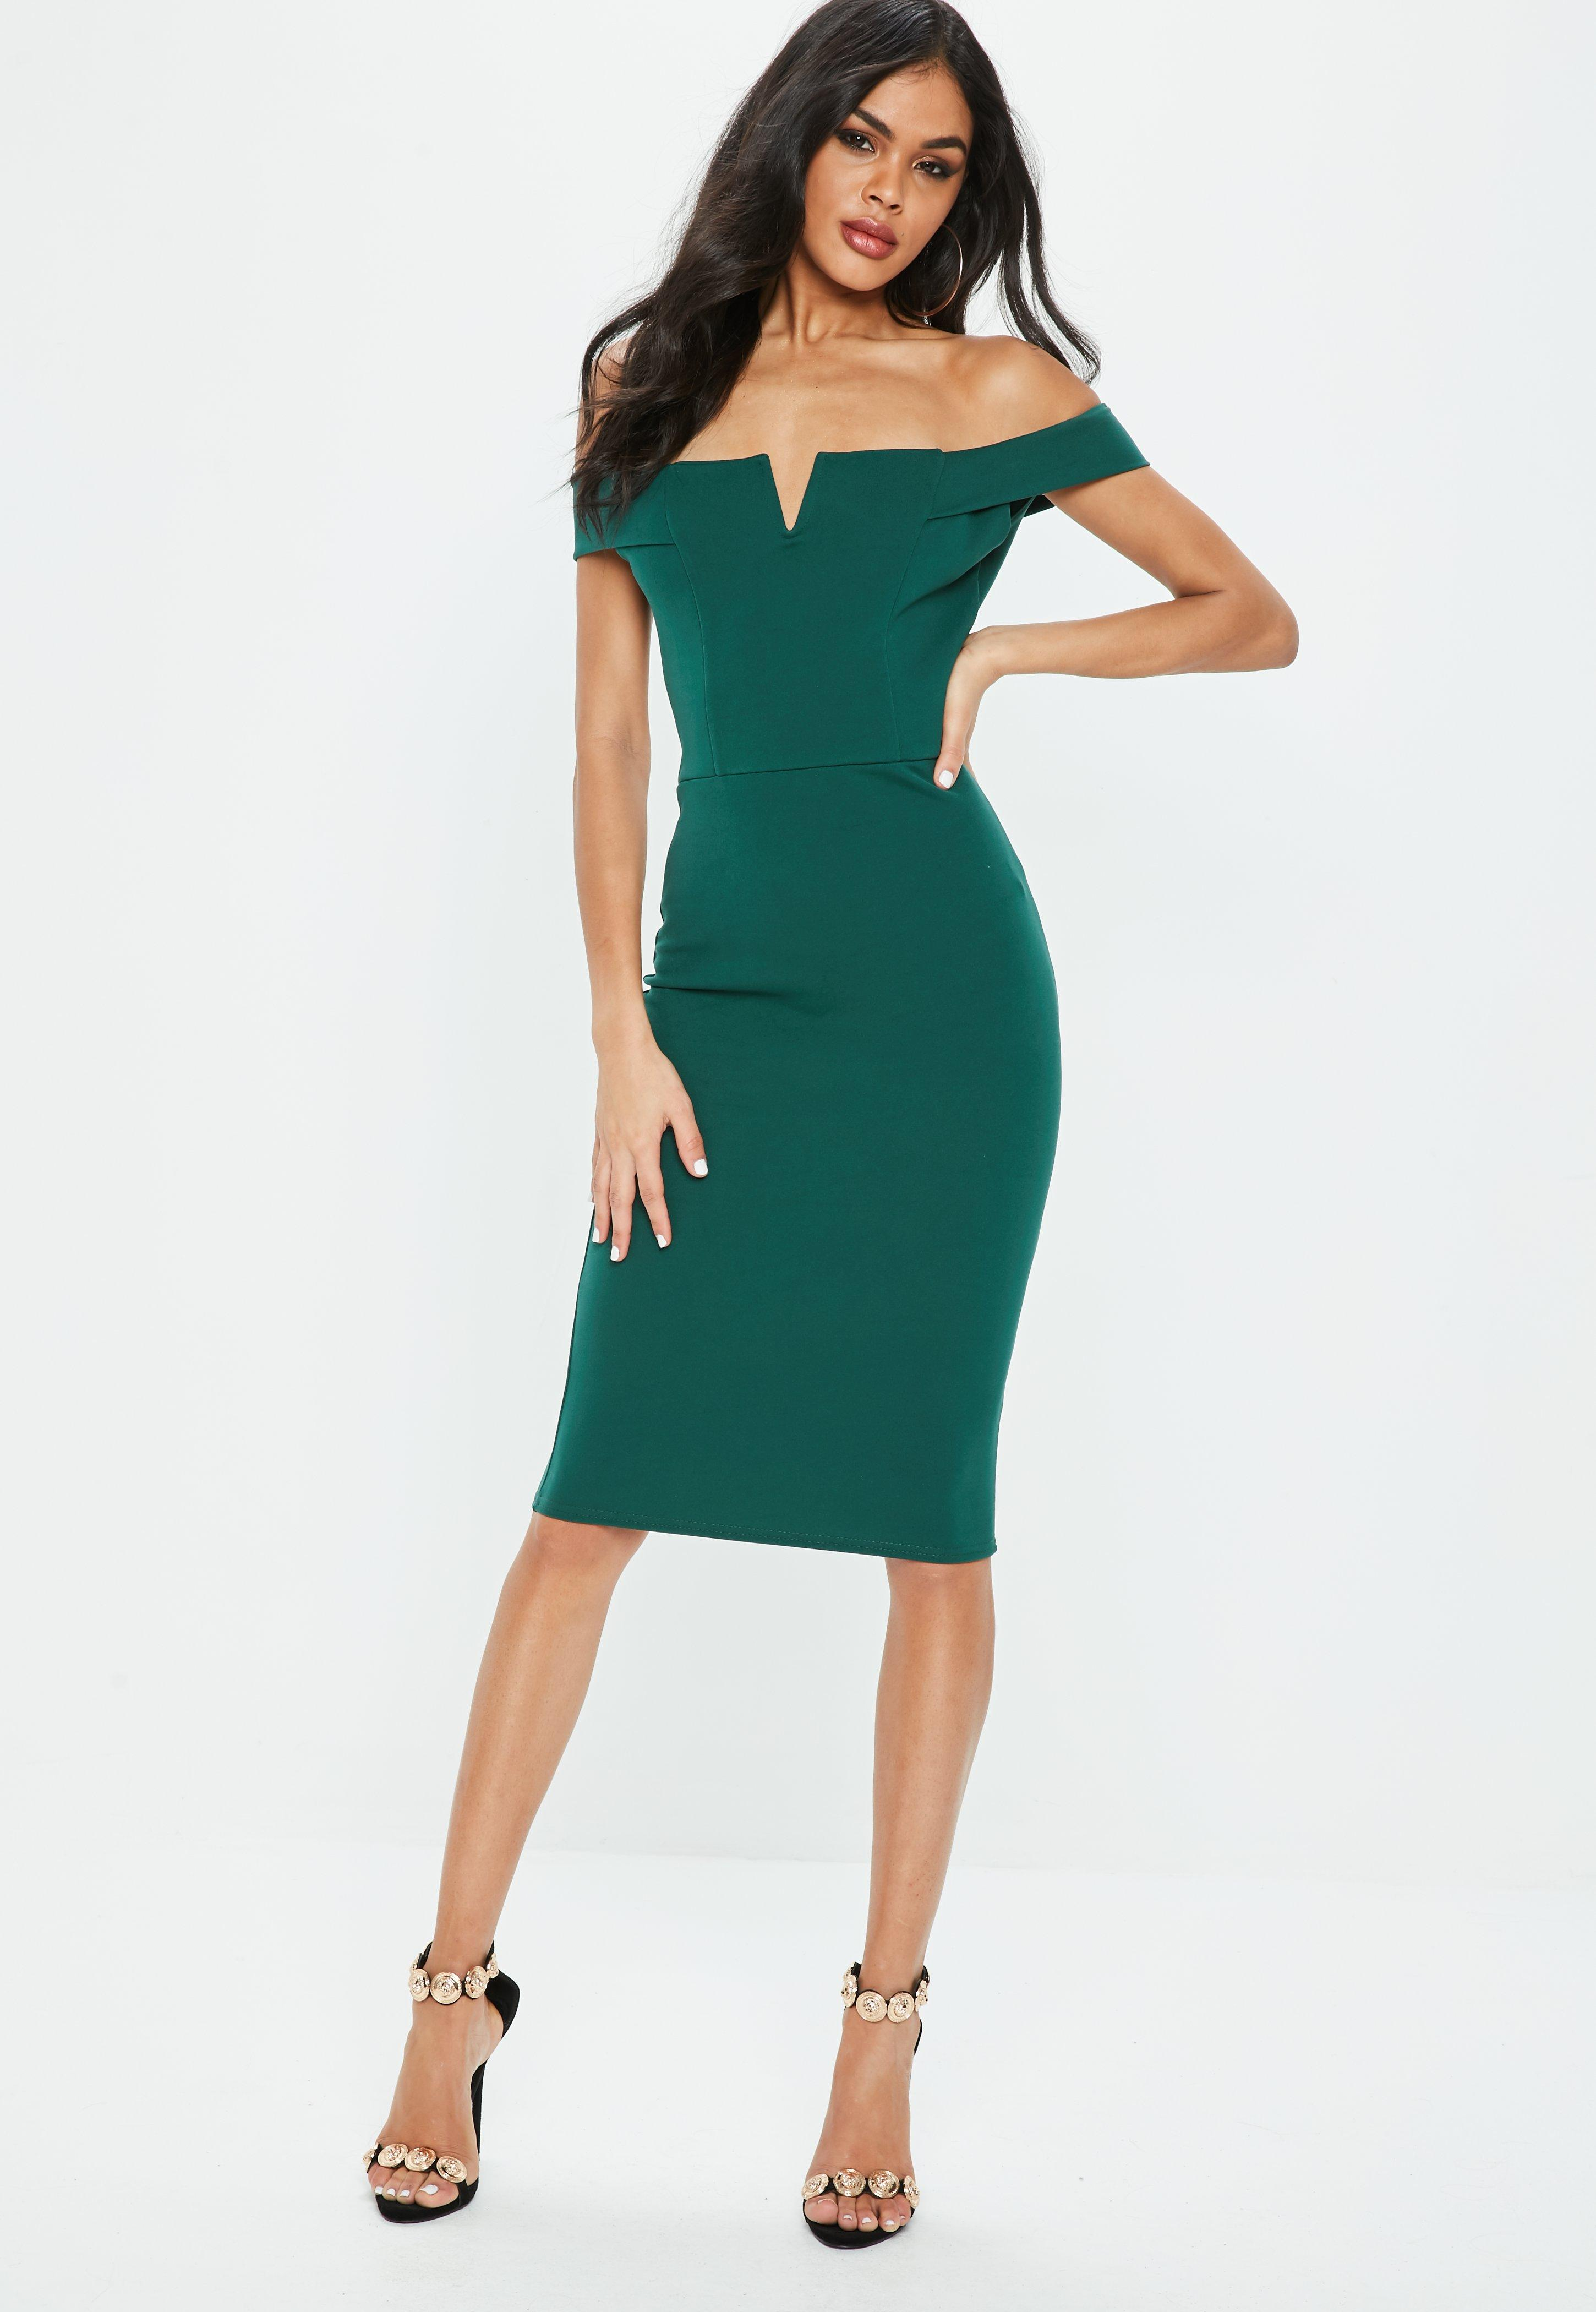 Green Dresses - Emerald & Mint Green Dresses | Missguided